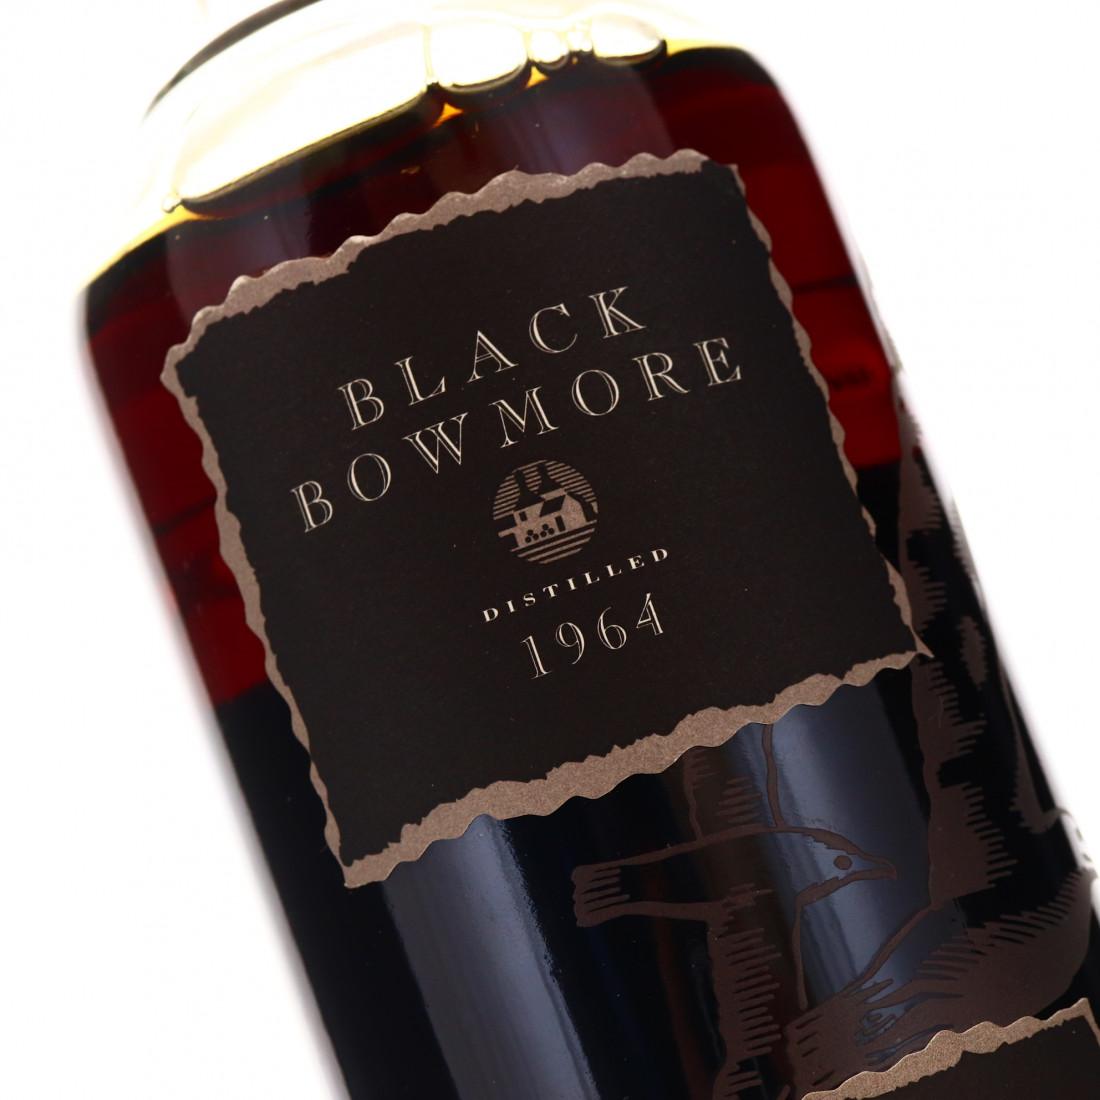 Bowmore 1964 Black Bowmore 30 Year Old 2nd Edition